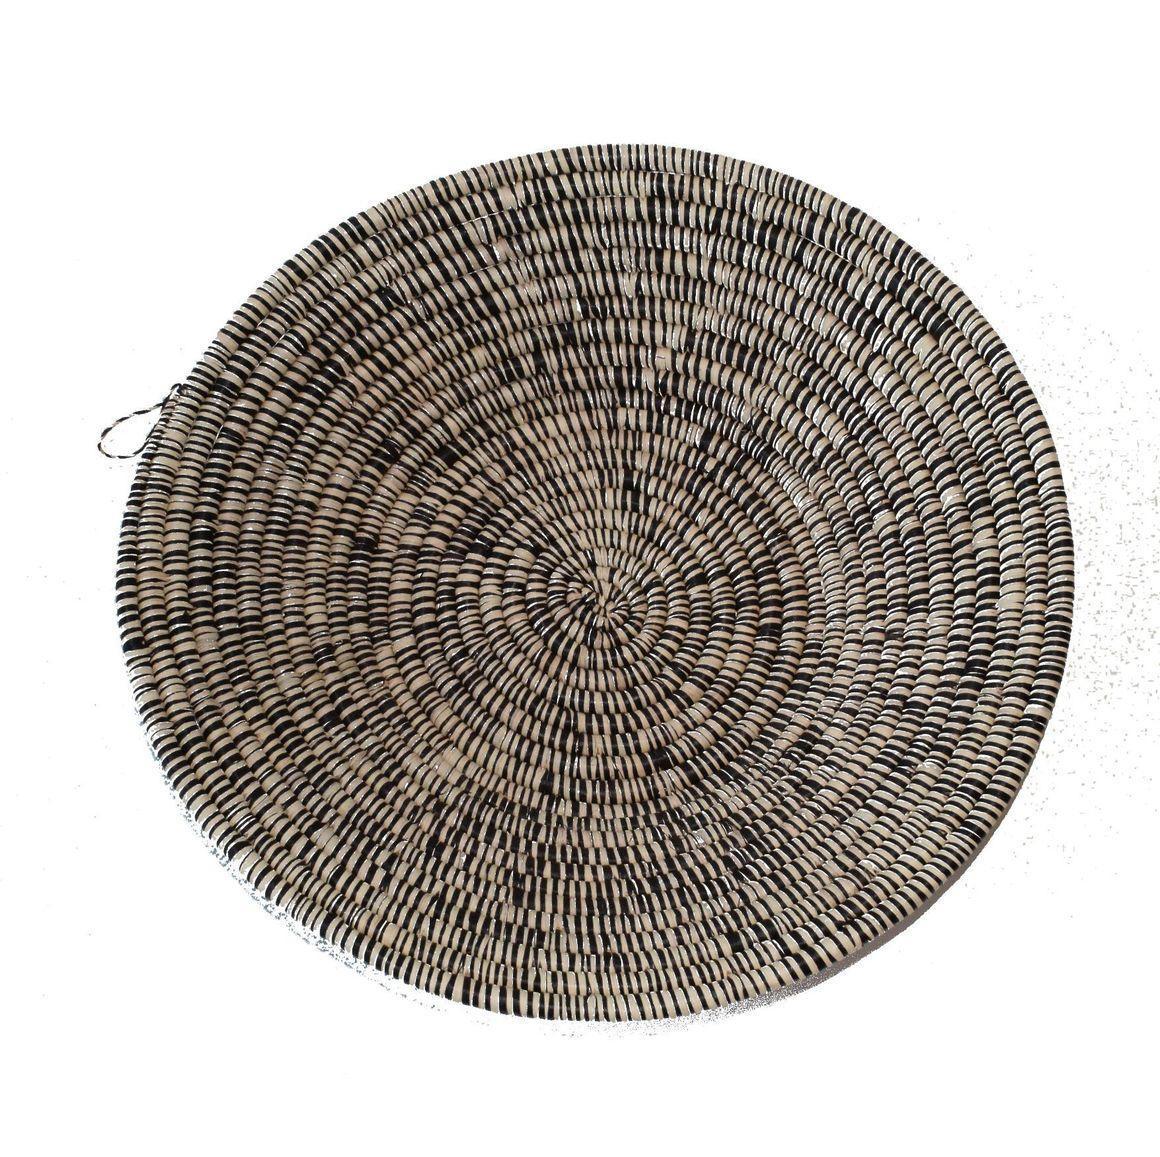 Small 20cm diameter woven bowl - Stitched | Trada Marketplace